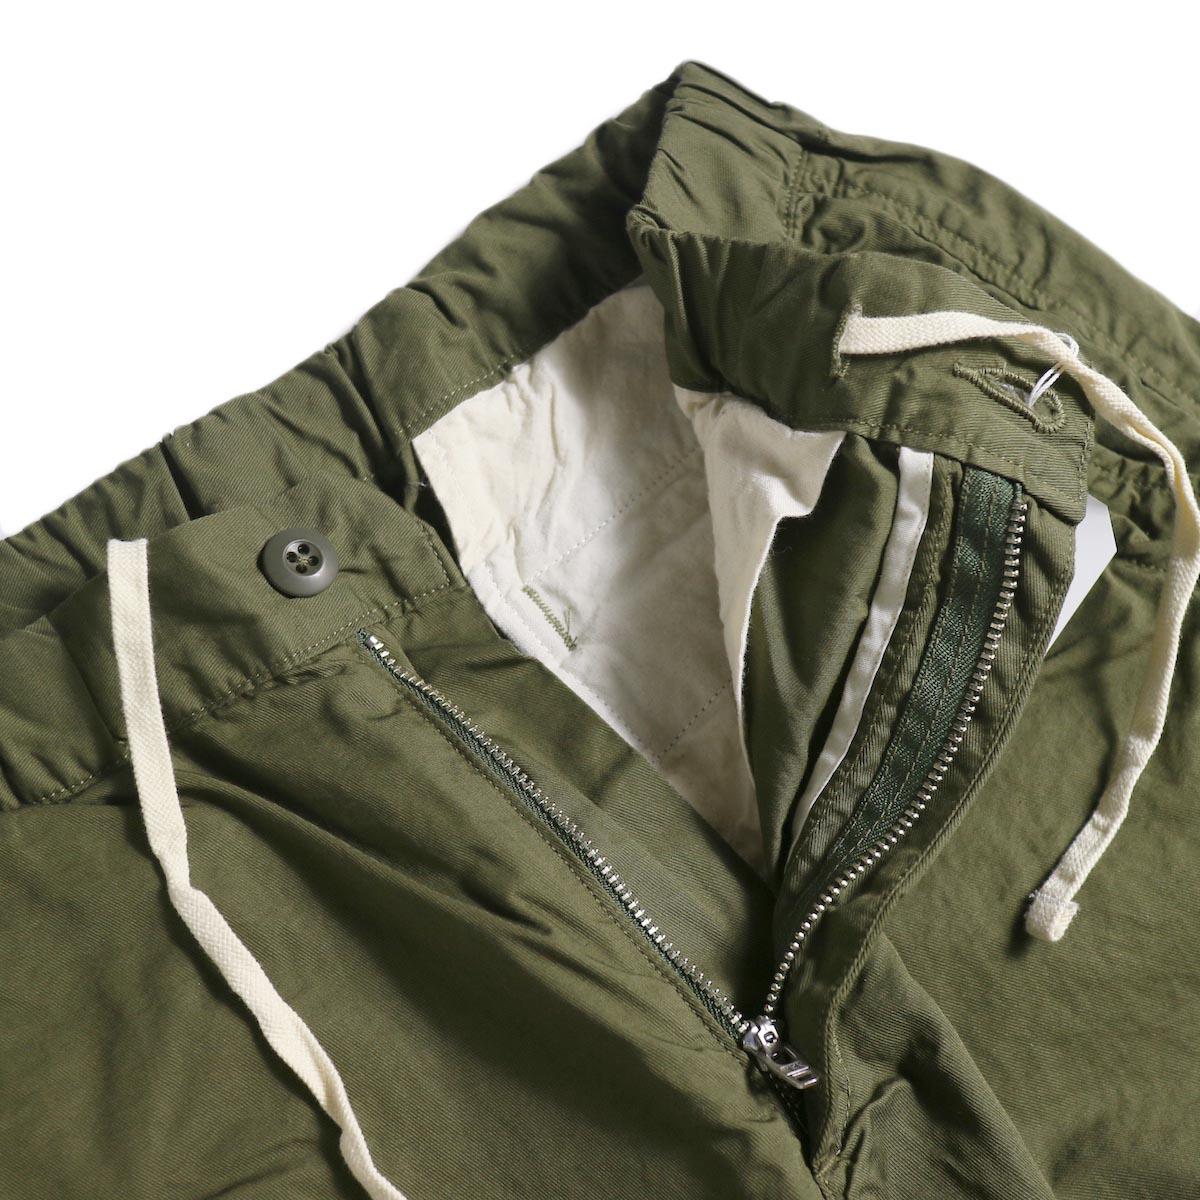 BRENA / Cotton&Linen Washer Kersey Coq Pants (Amg)ジップフライ